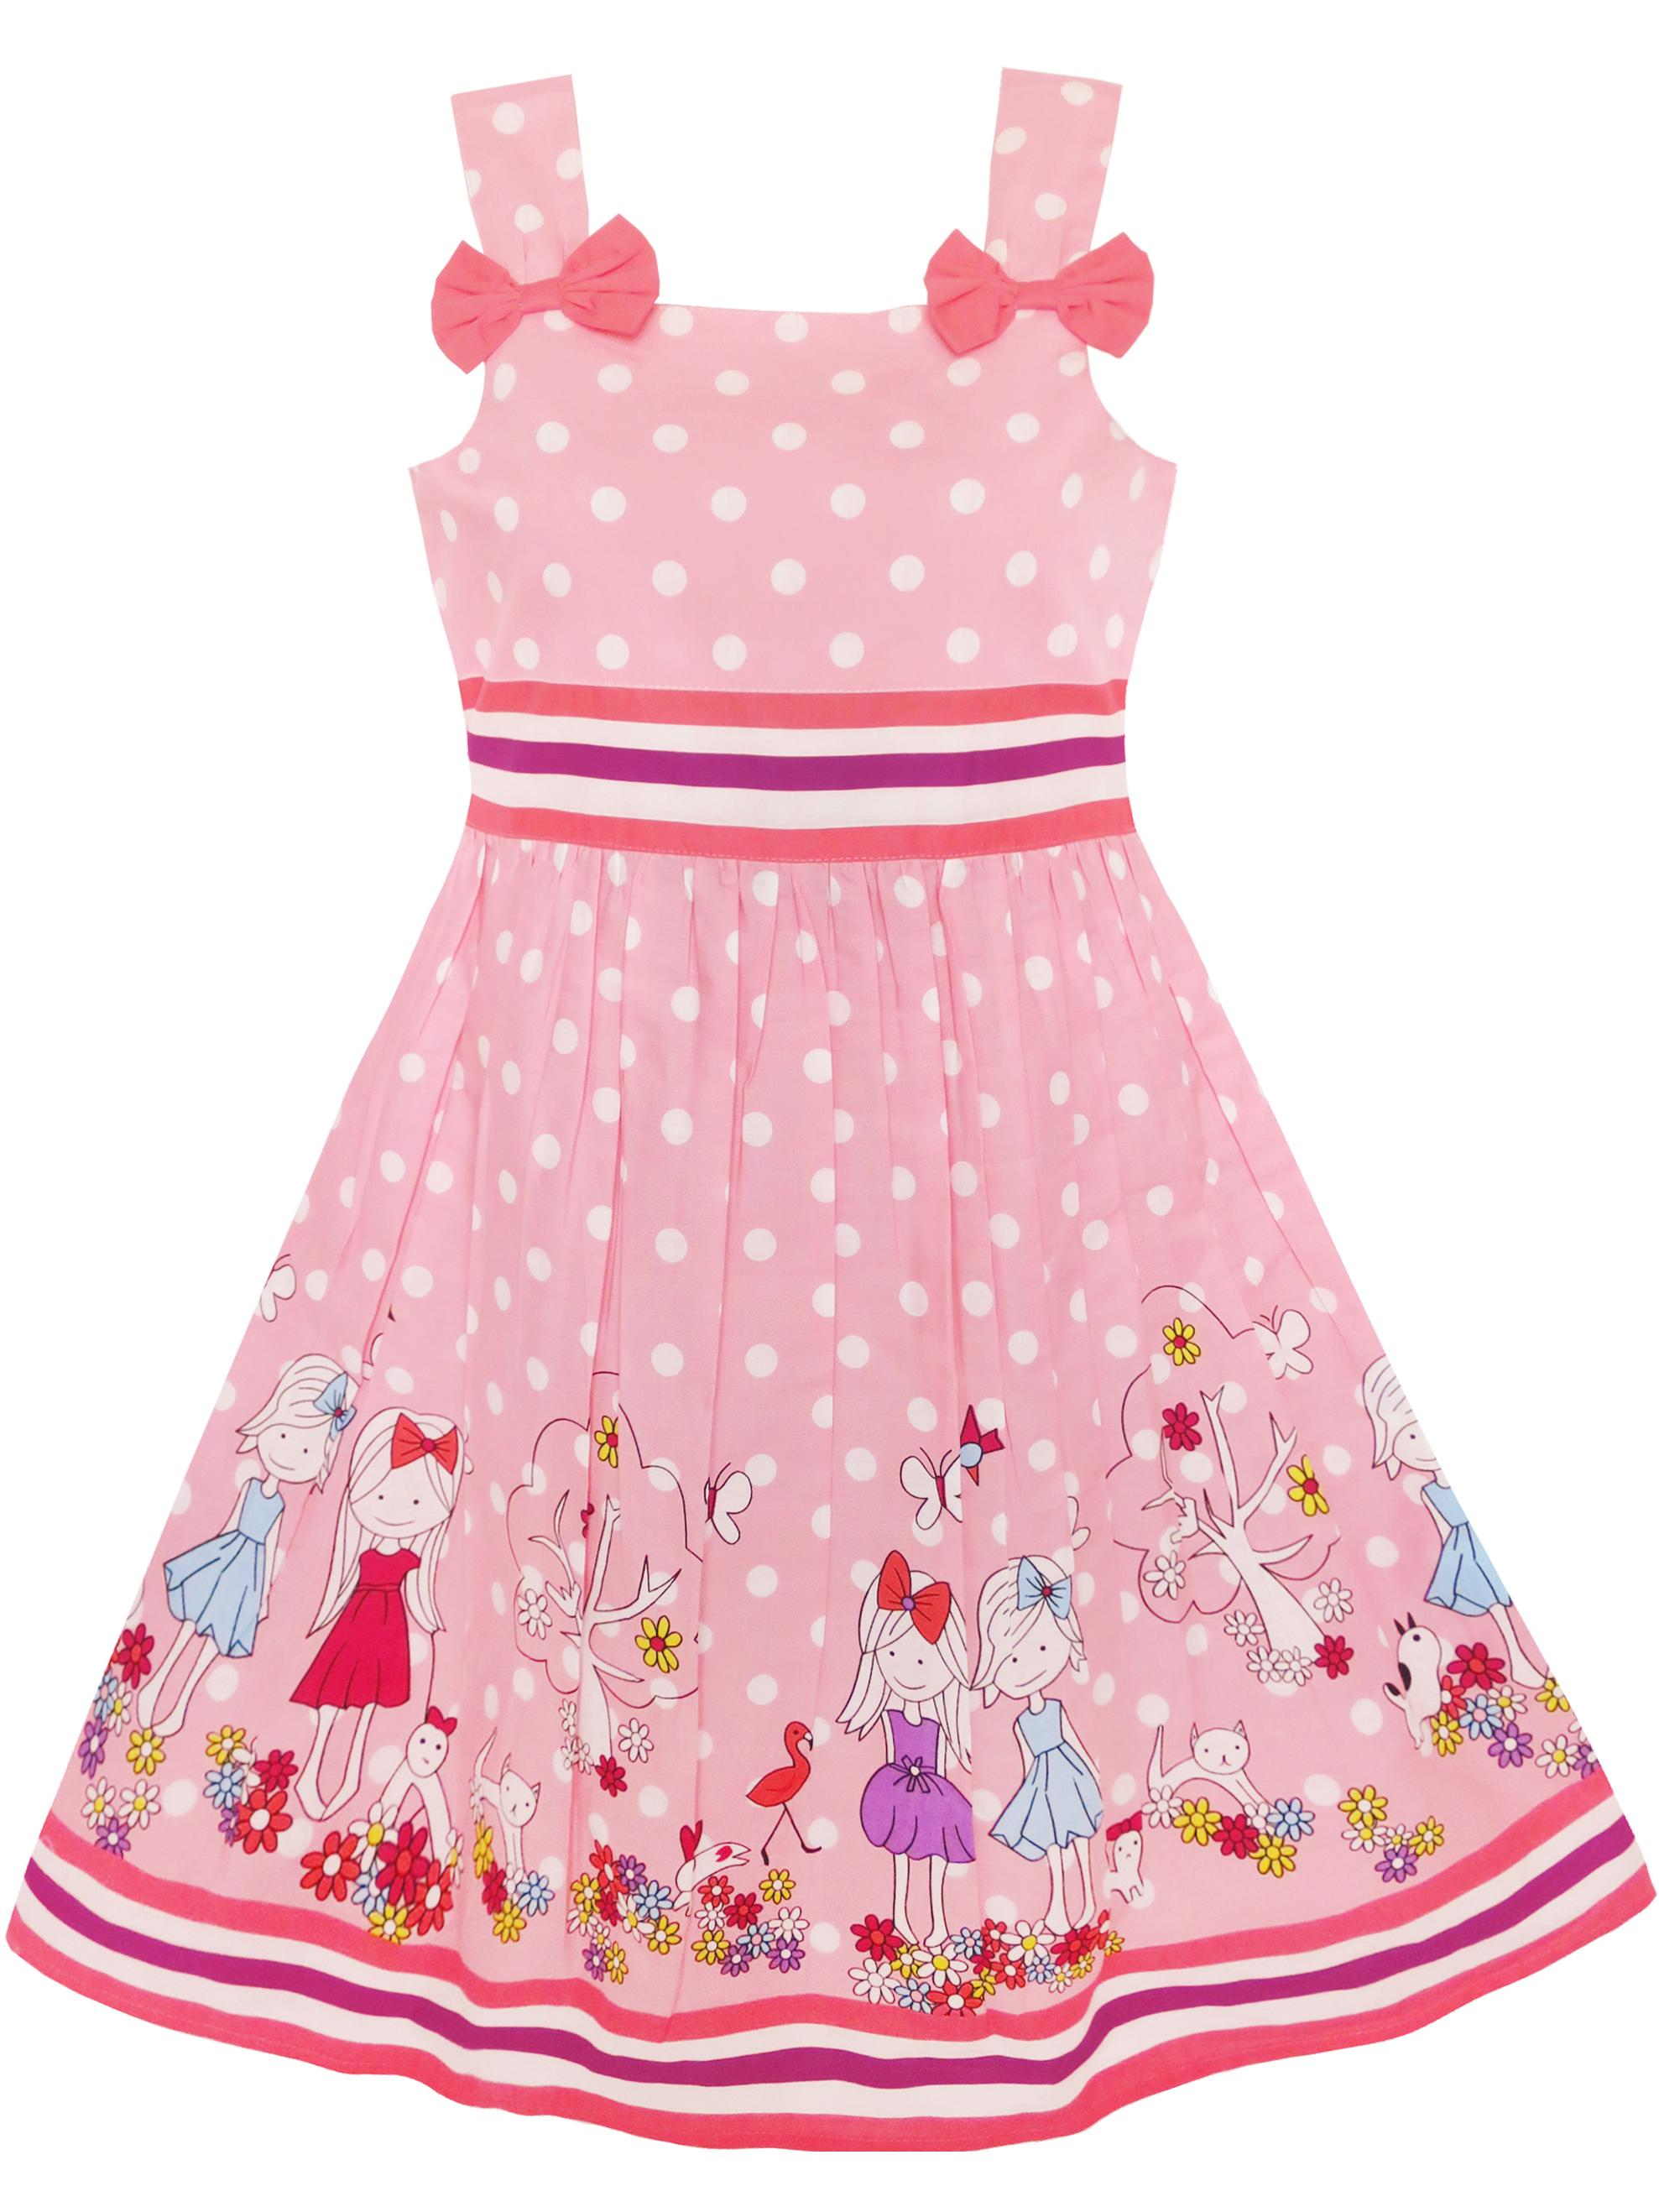 Girls Dress Blue Ladybug Pink Dot Children Clothing 2-3